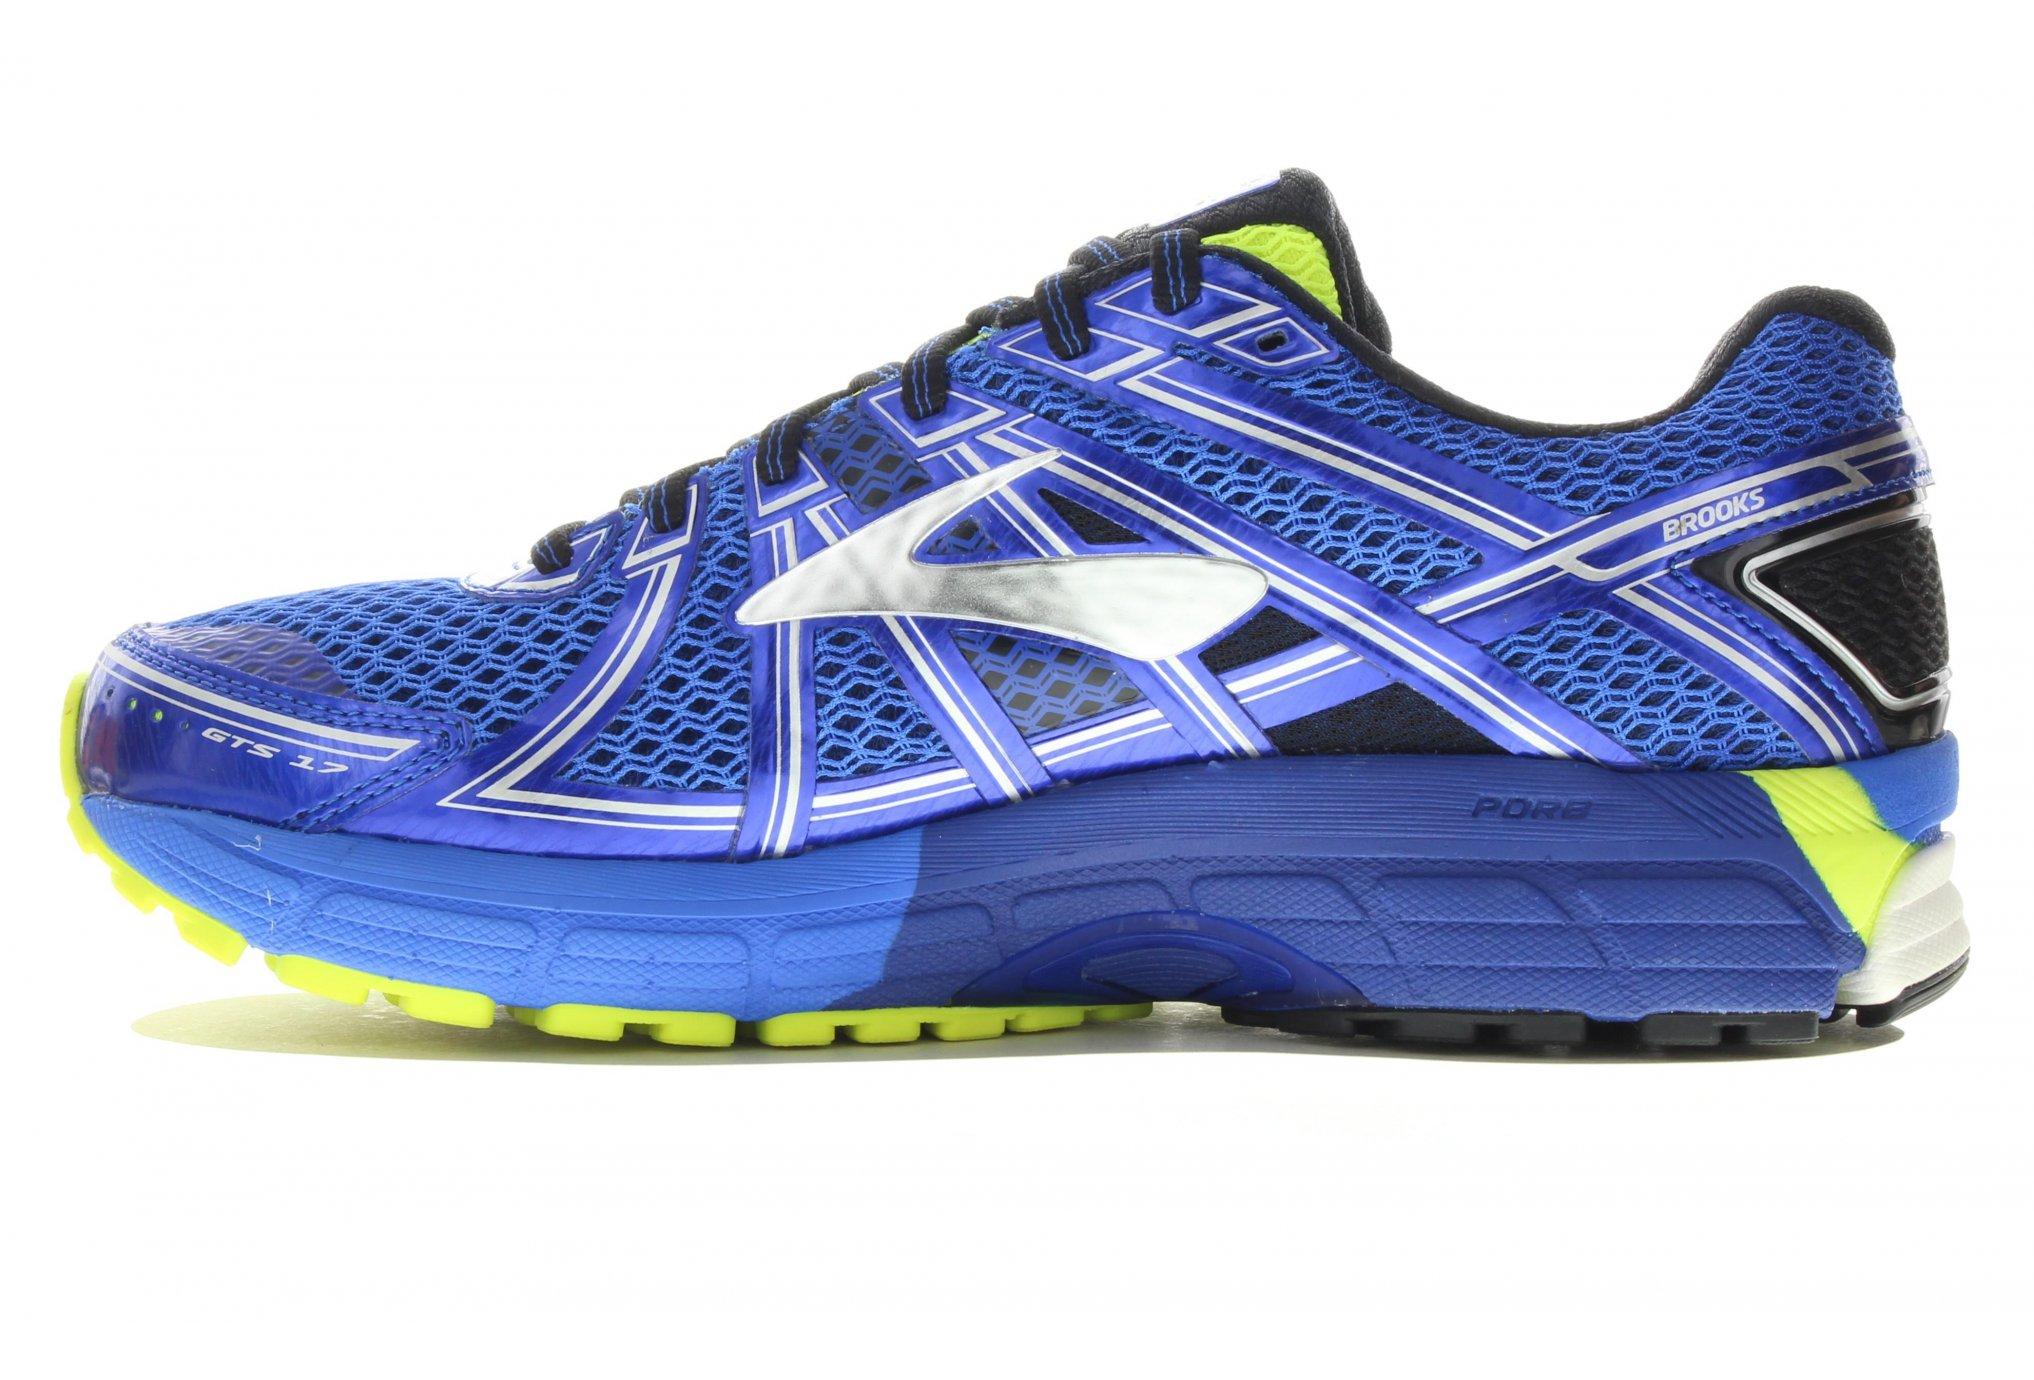 Chaussure running ou trail